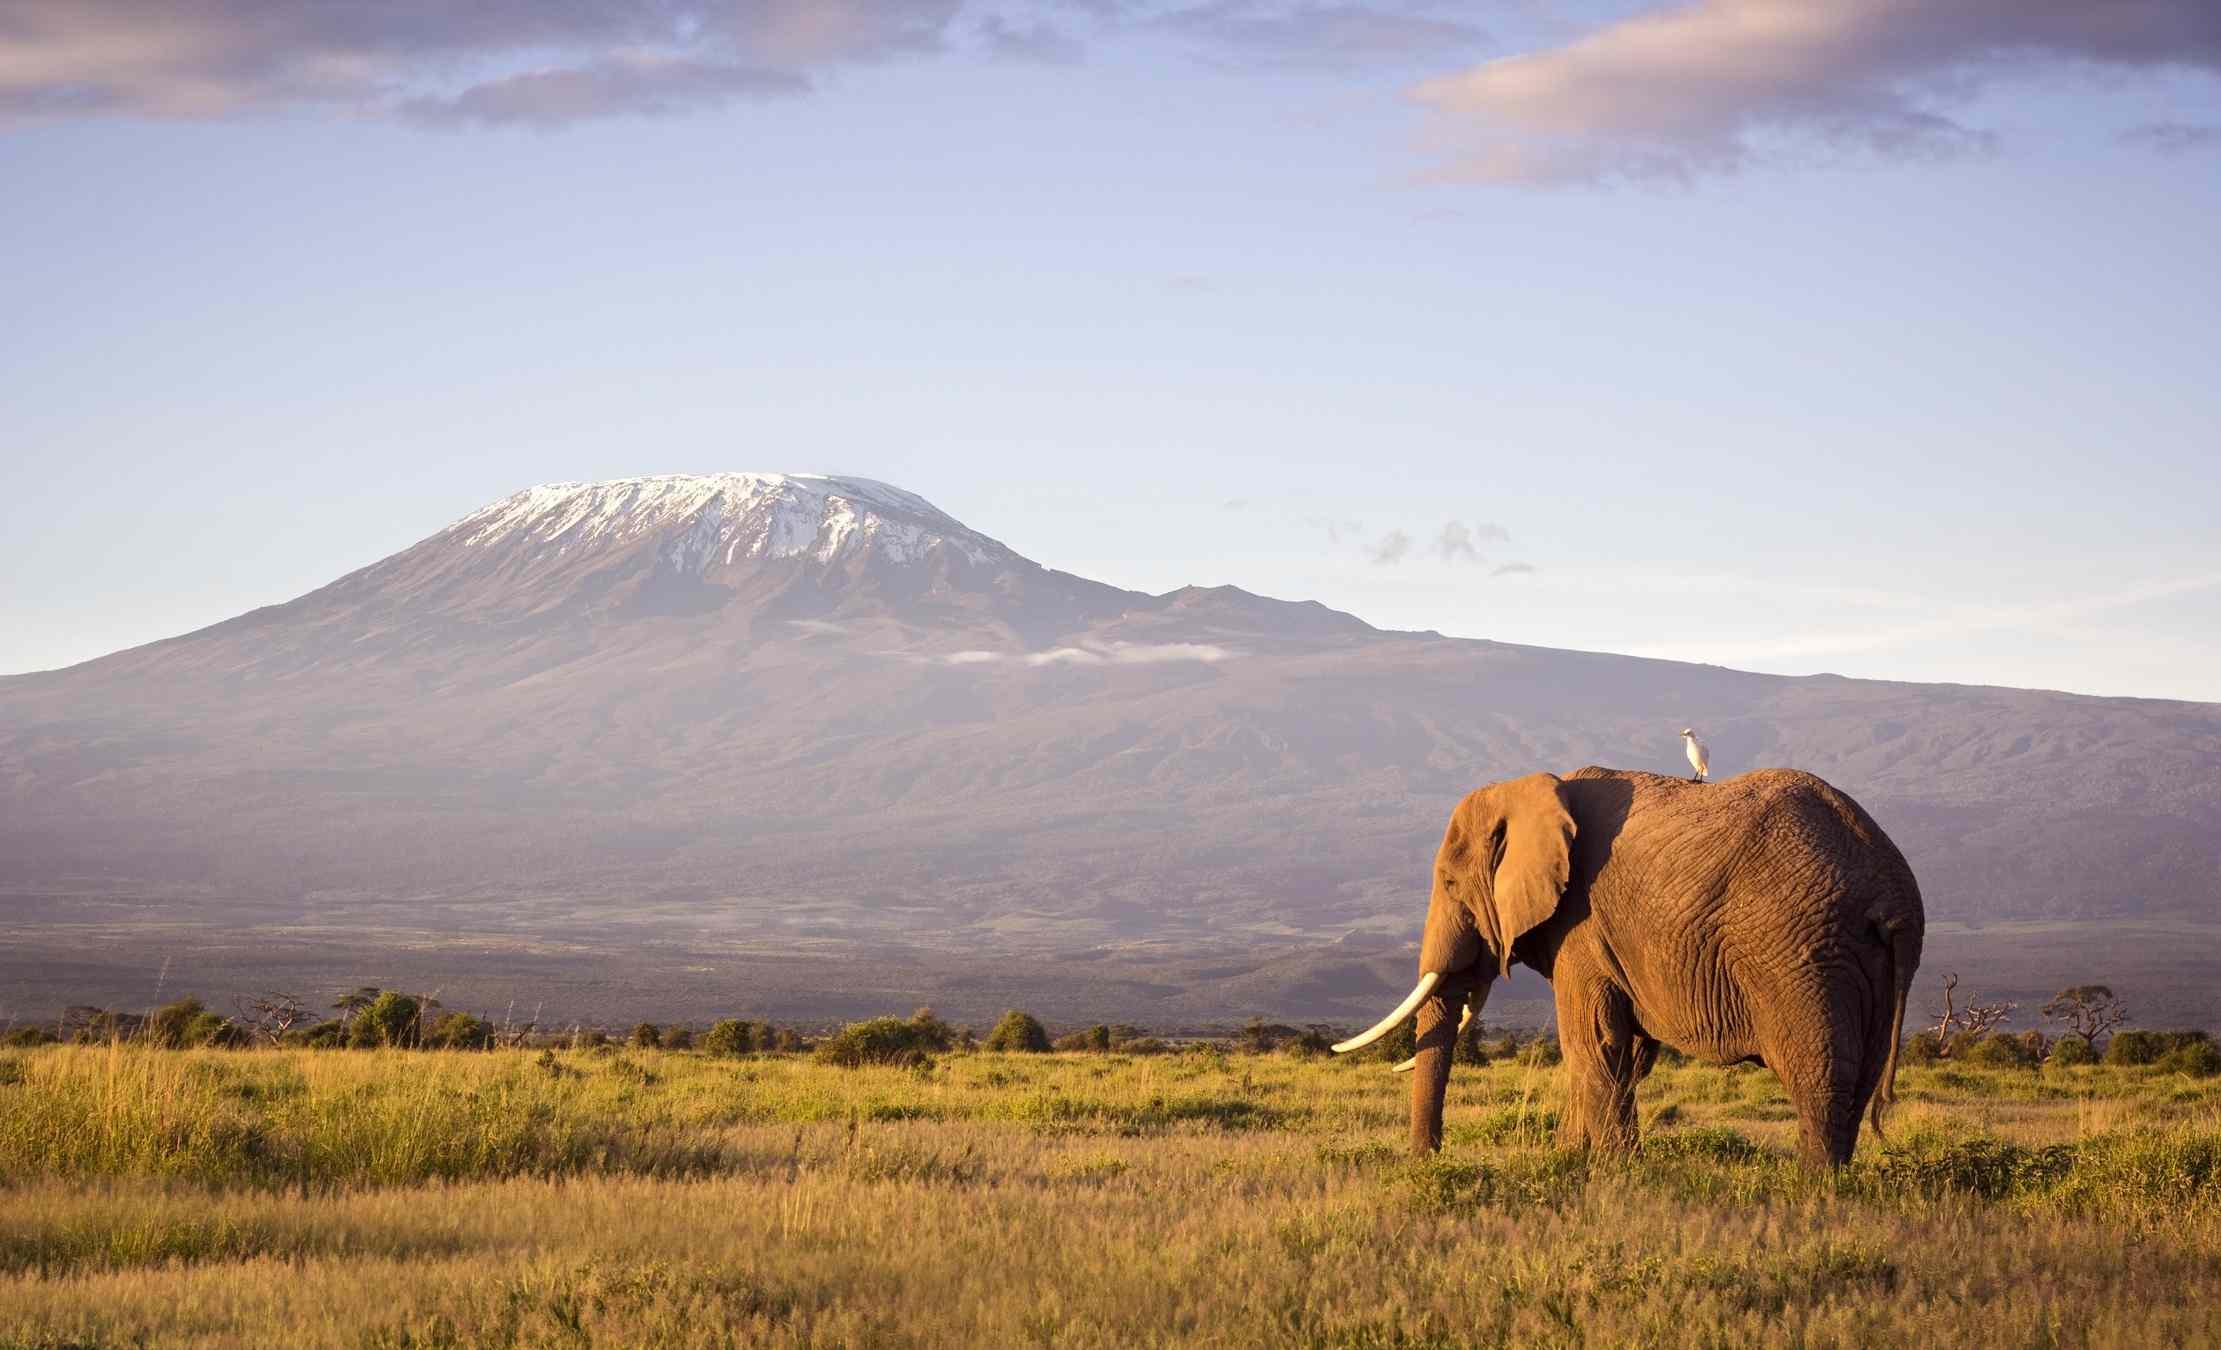 Tusker elephant with Mount Kilimanjaro in the background, Amboseli